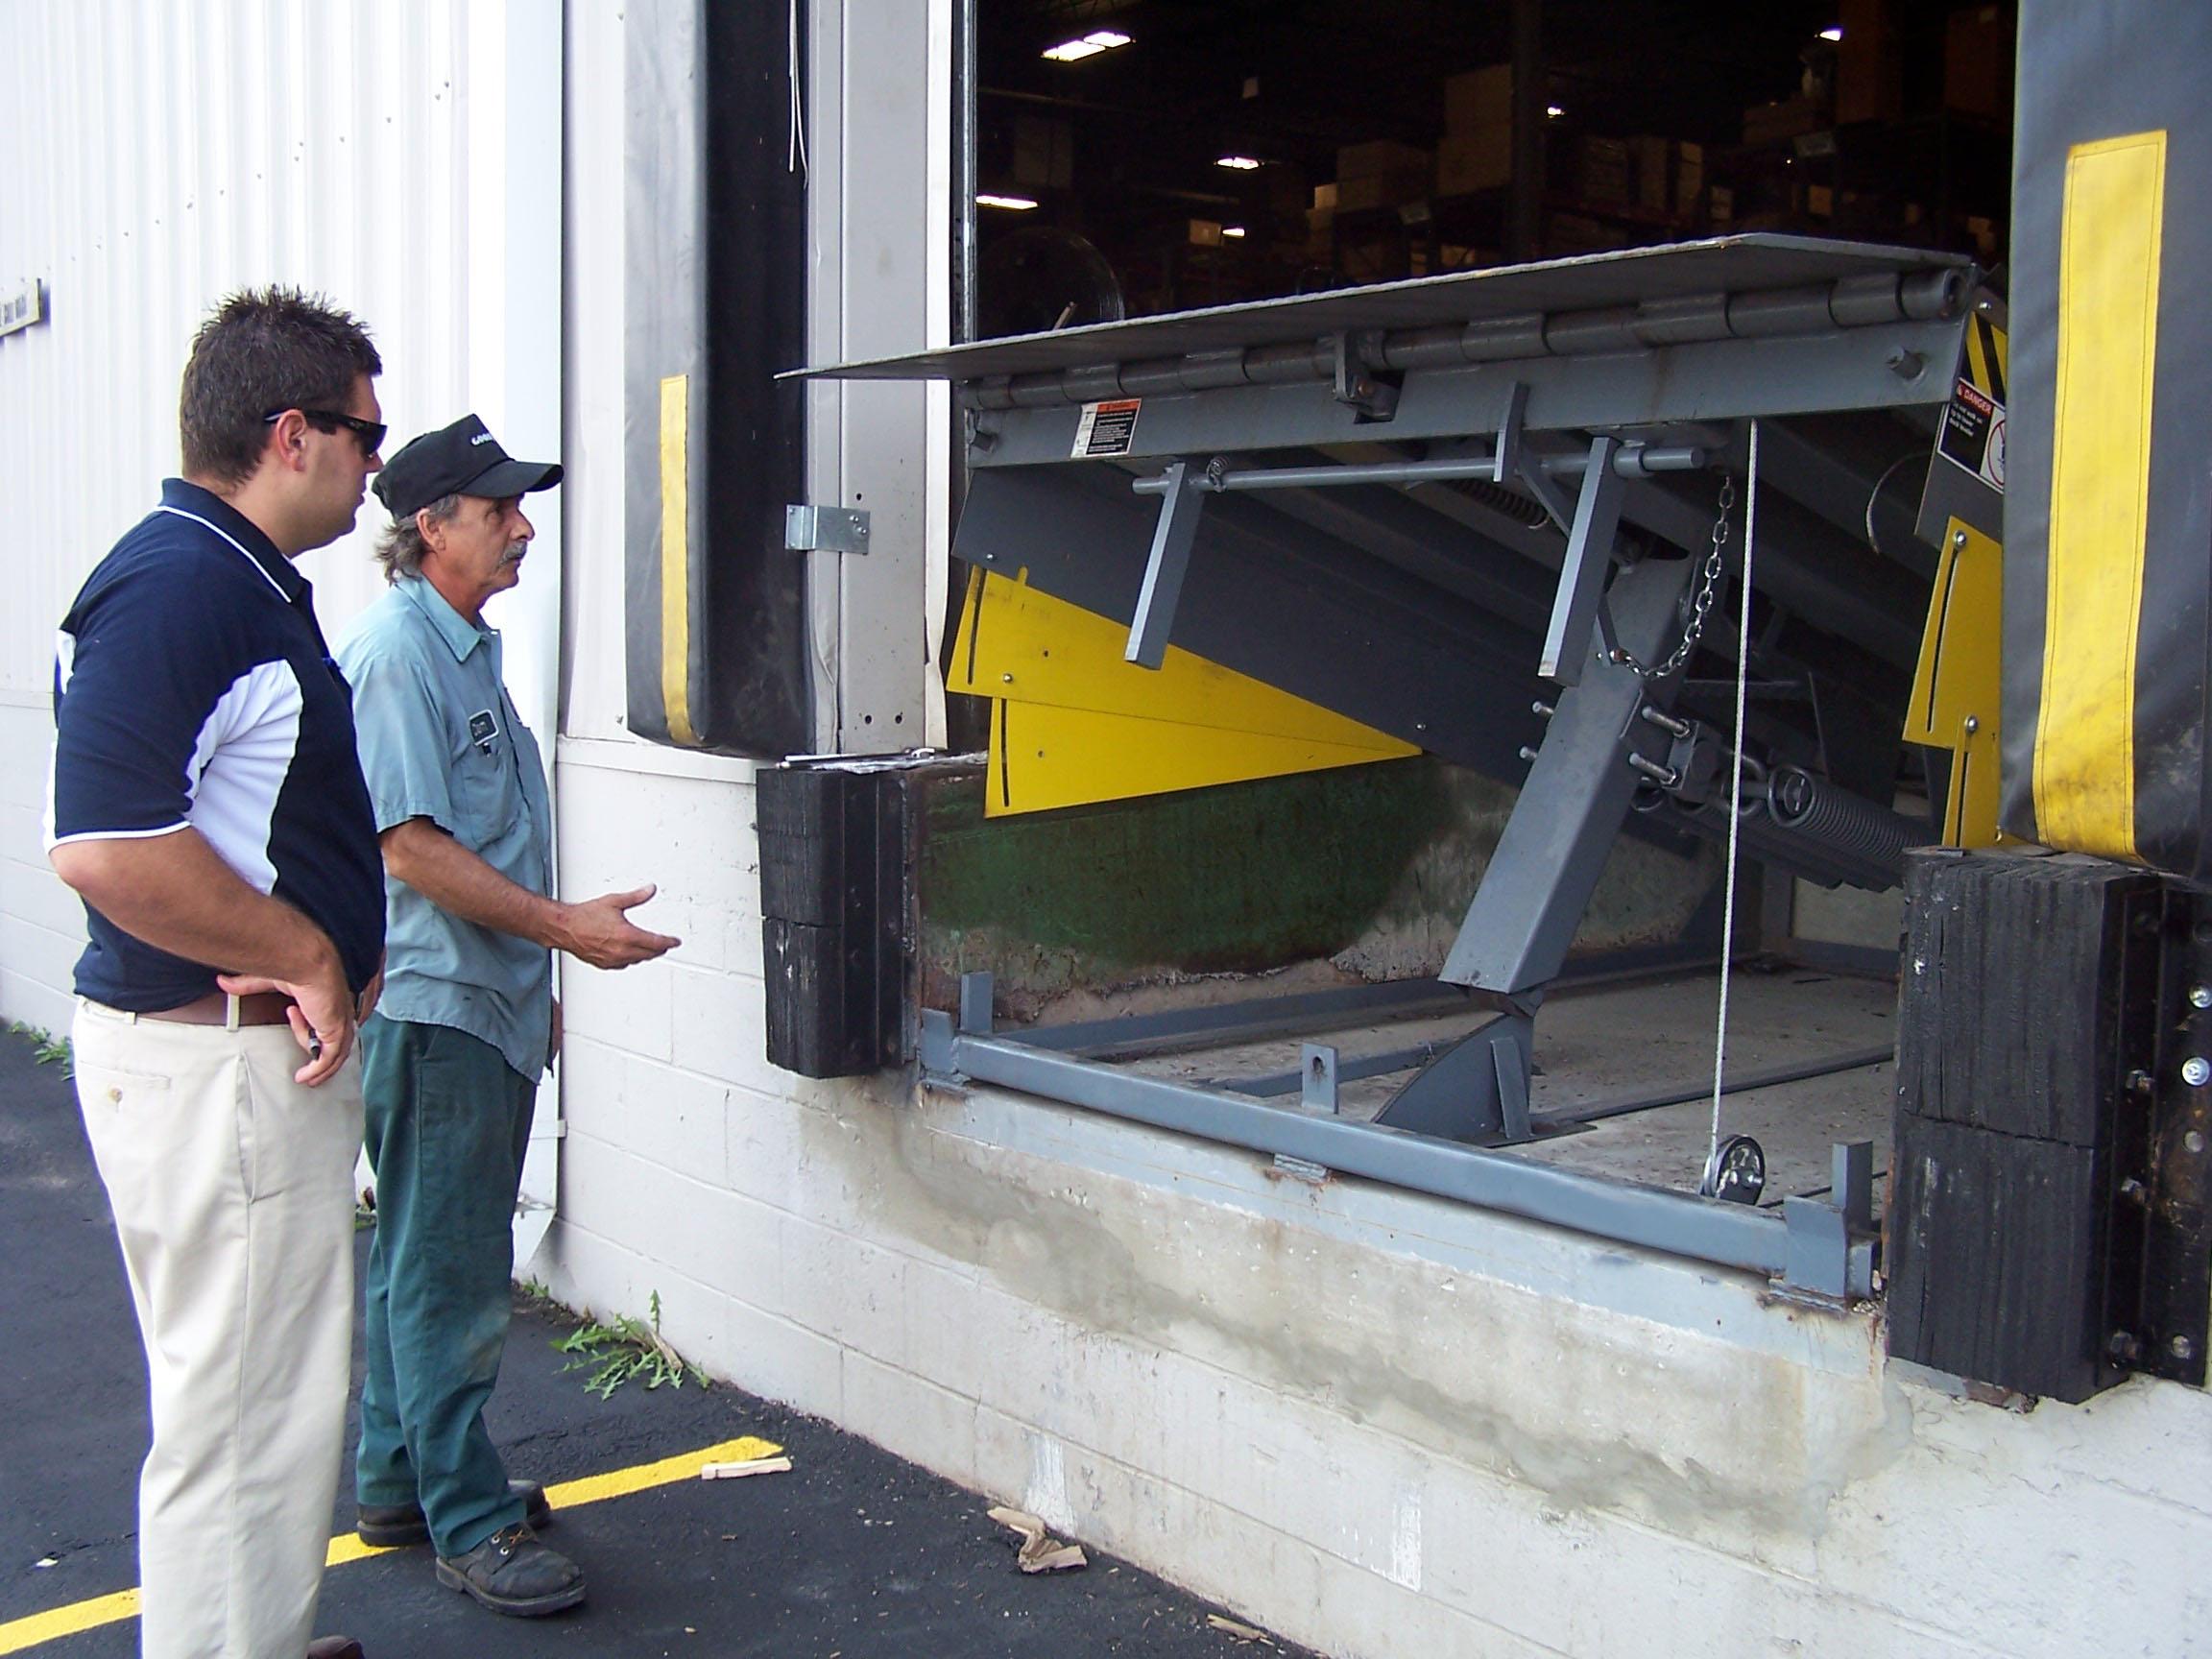 McKee service techs inspecting a loading dock leveler for an overhead door garage bay